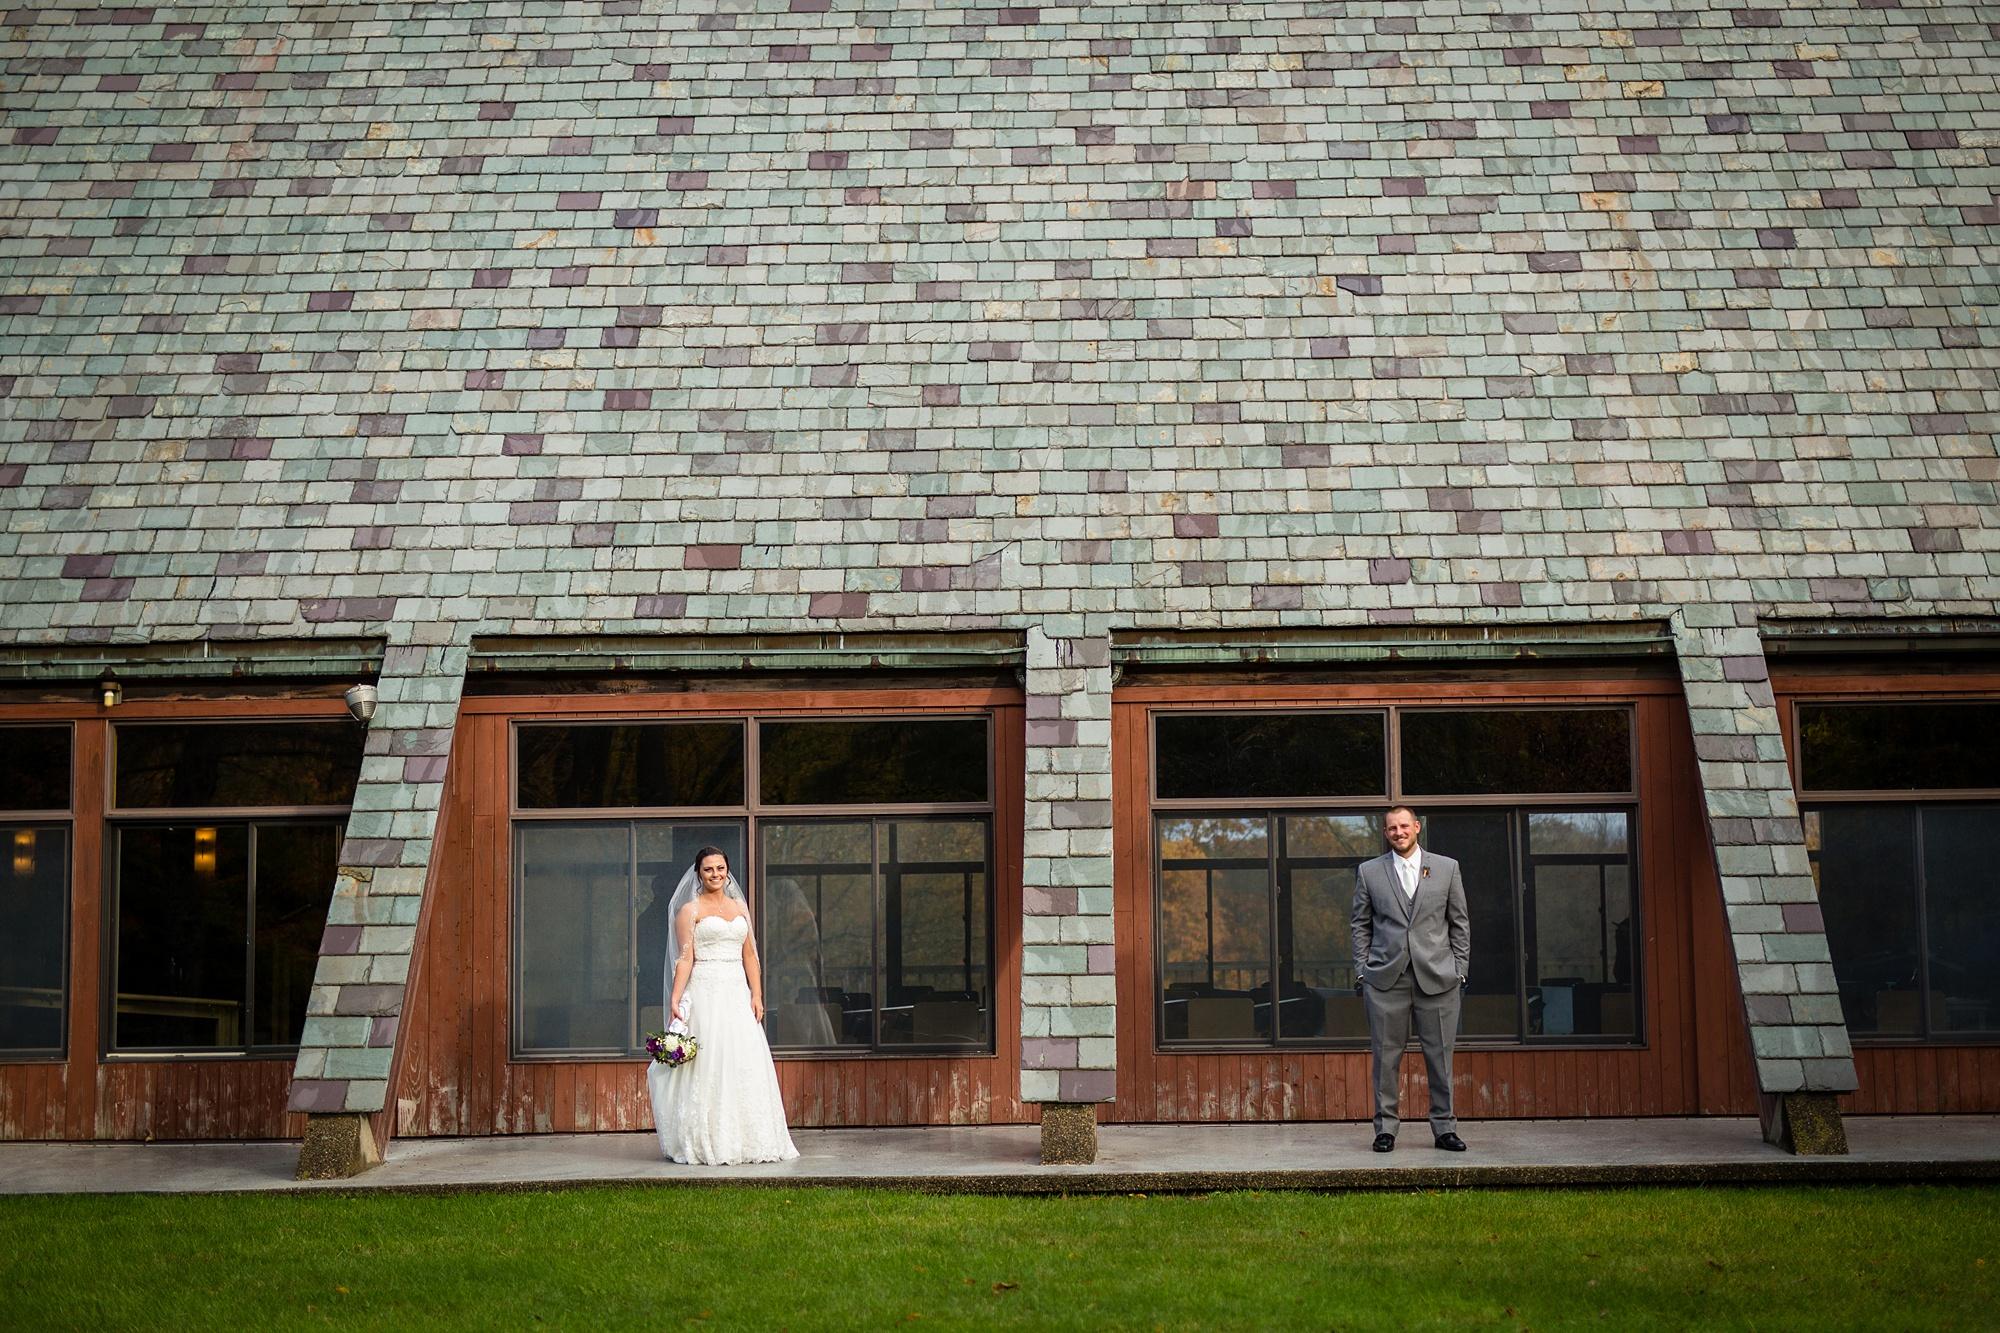 Brandon_Shafer_Photography_Emily_Travis_Kalamazoo_Wedding_Photography_0032.jpg